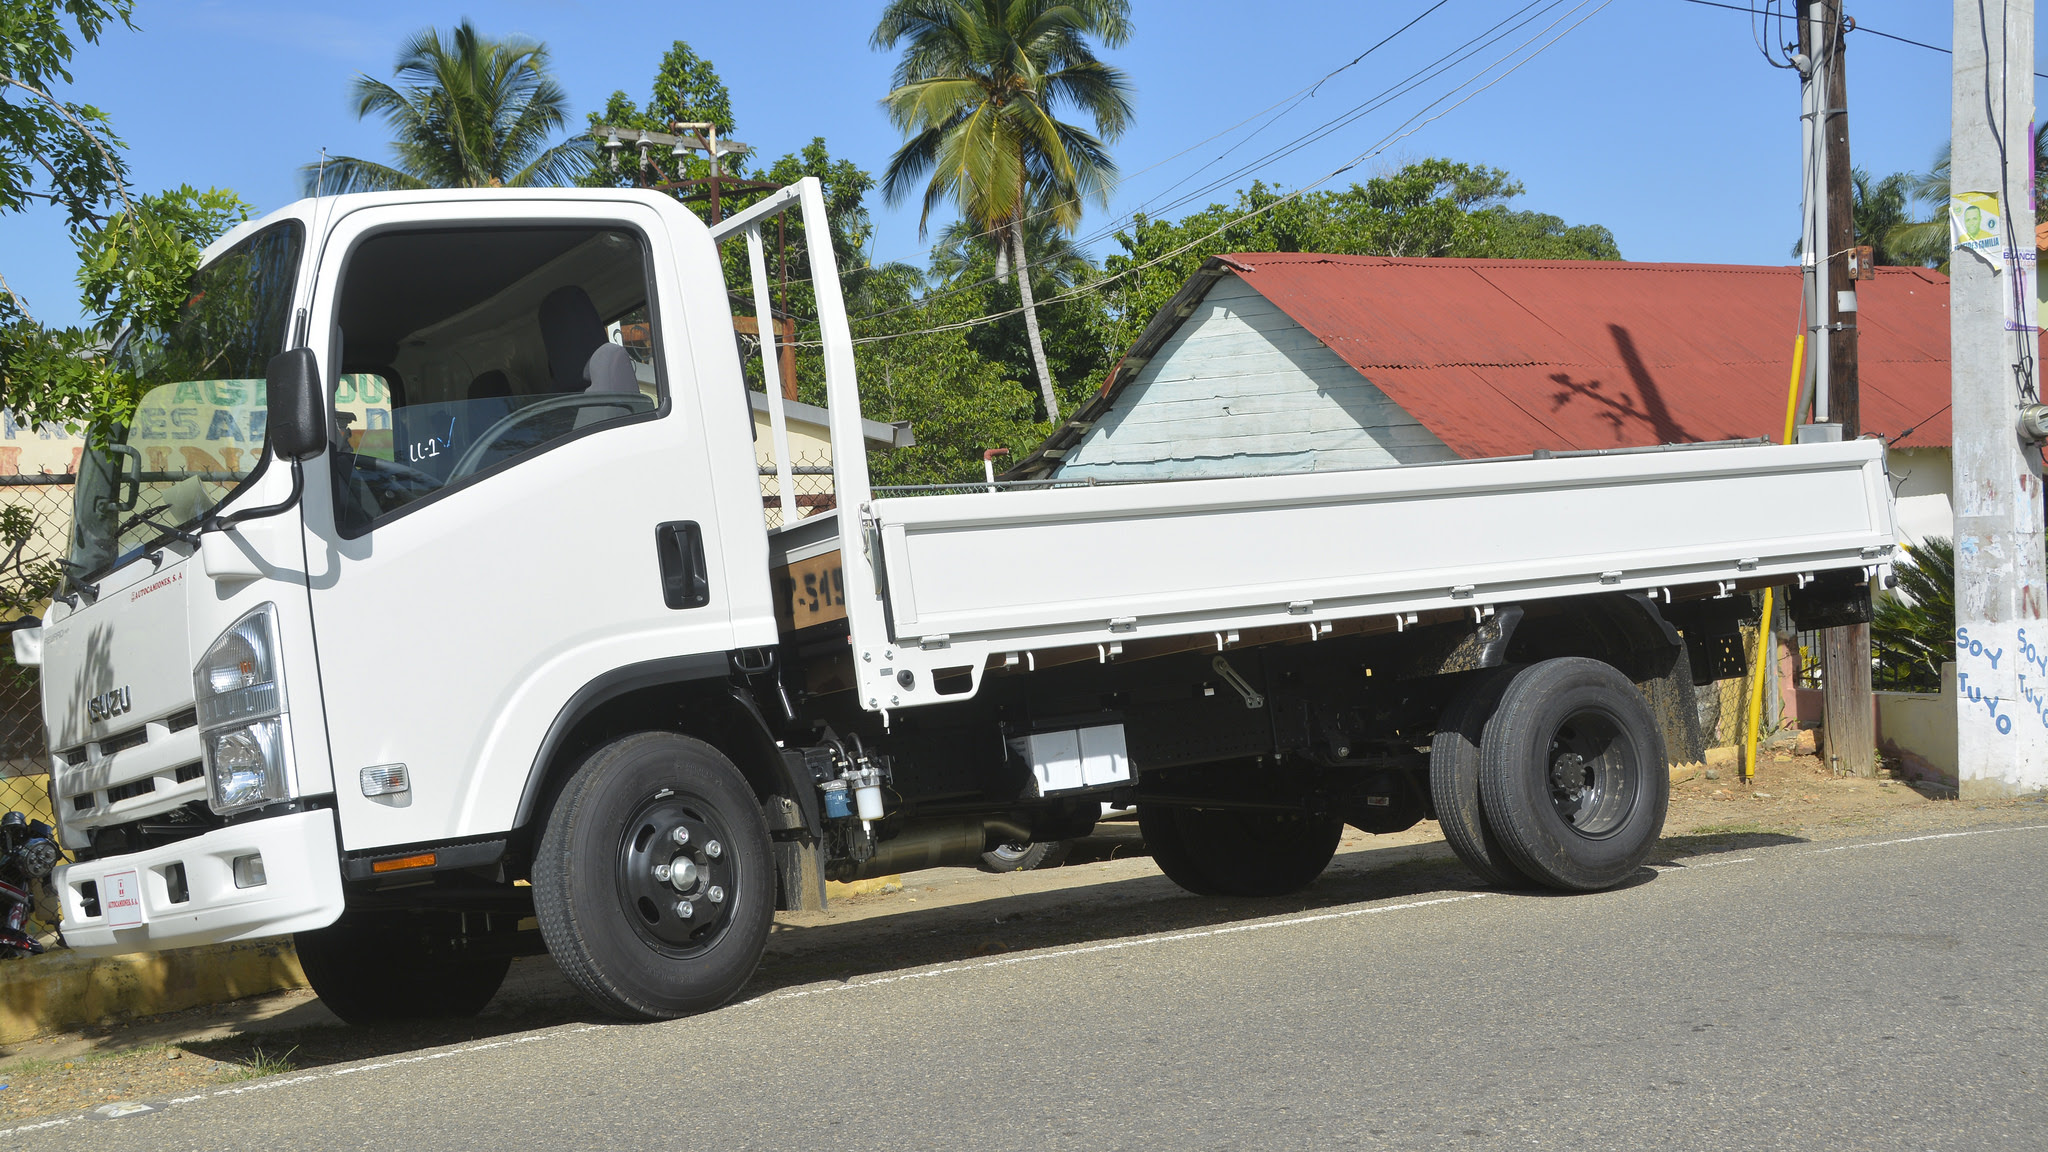 , Gobierno entrega camión a 124 productores de cáscara de naranja en Dajabón